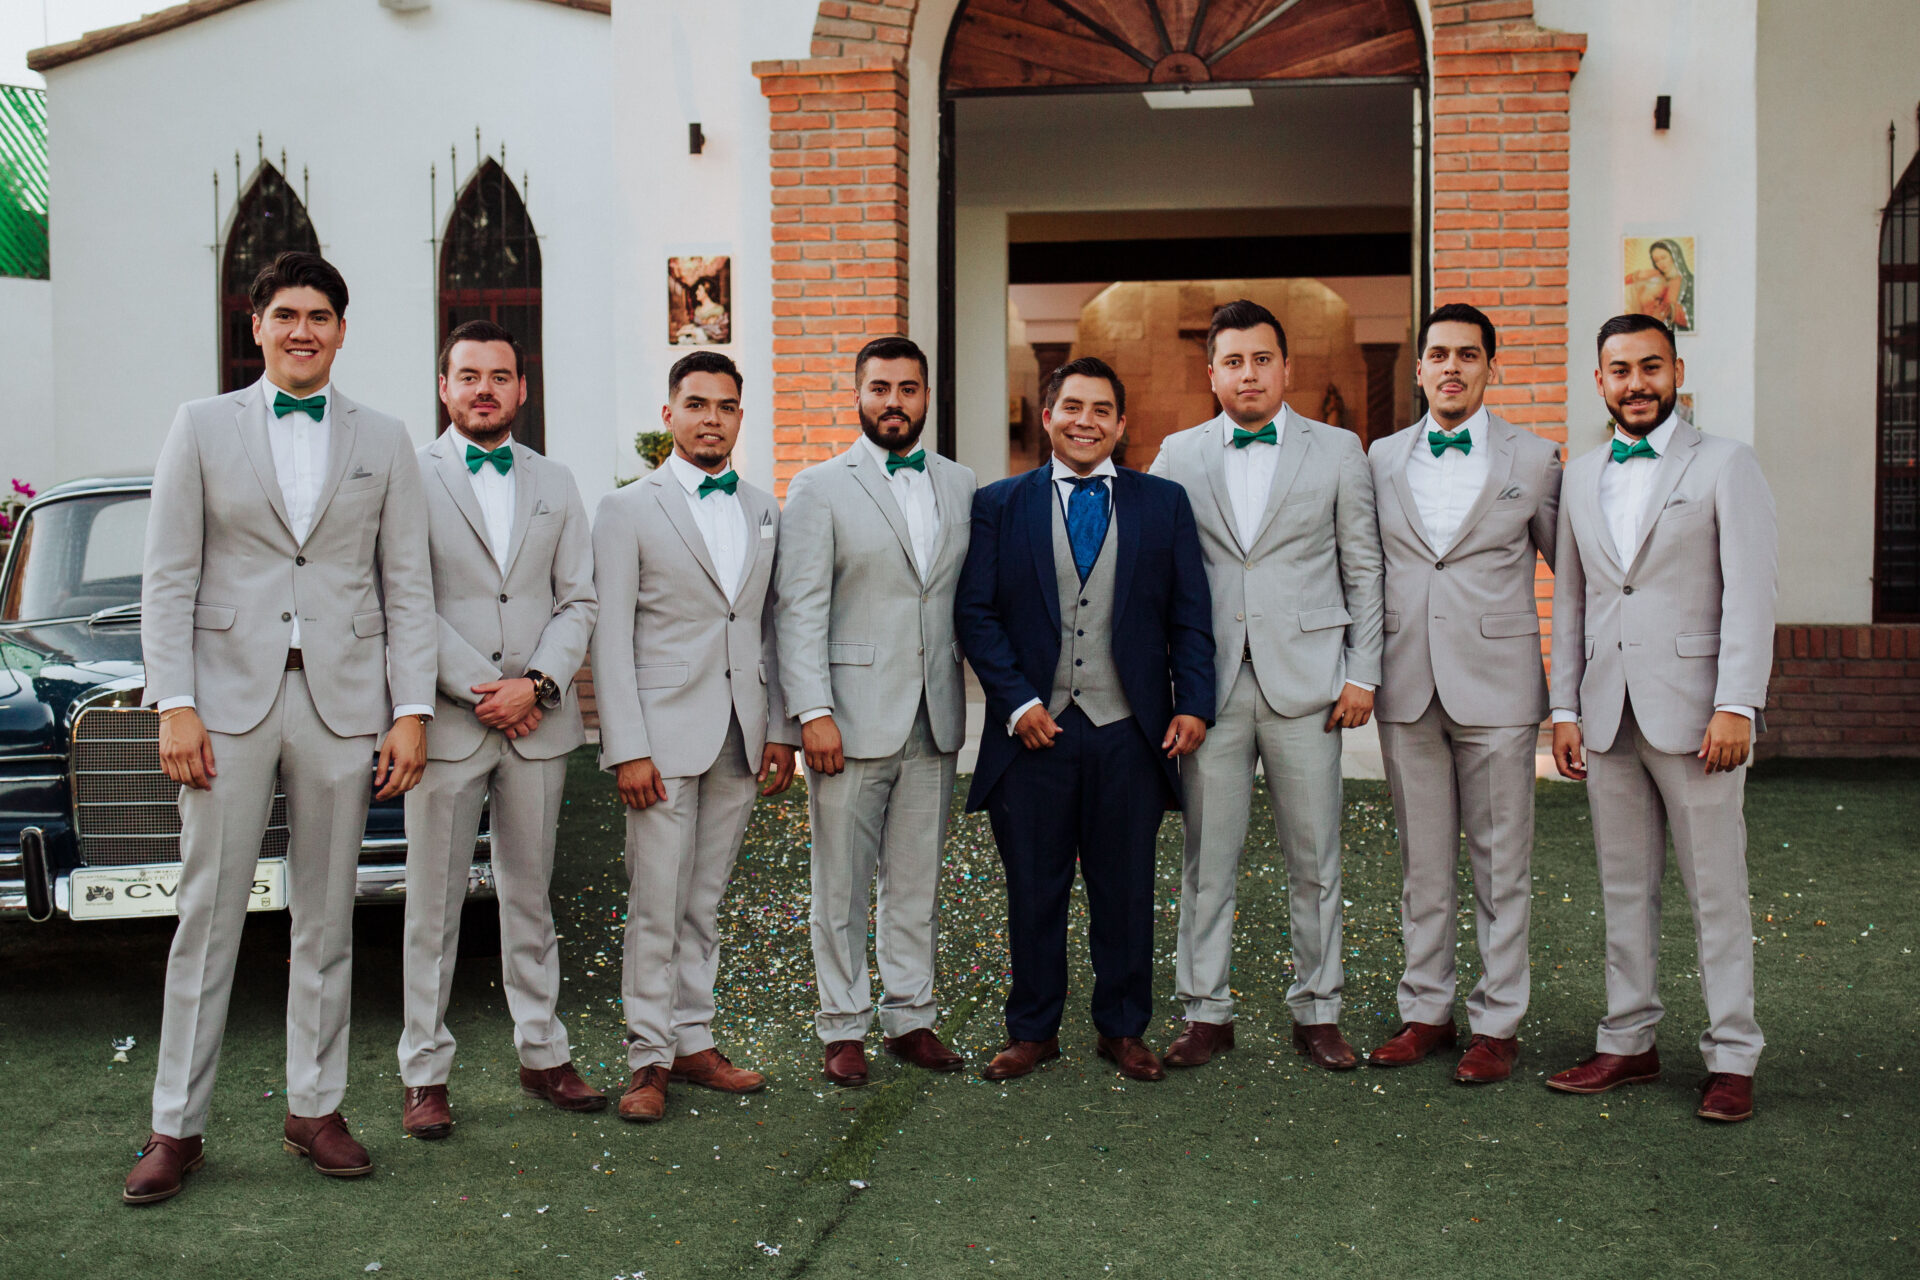 javier_noriega_fotografo_bodas_torreon_coahuila_zacatecas_wedding_photographer41a